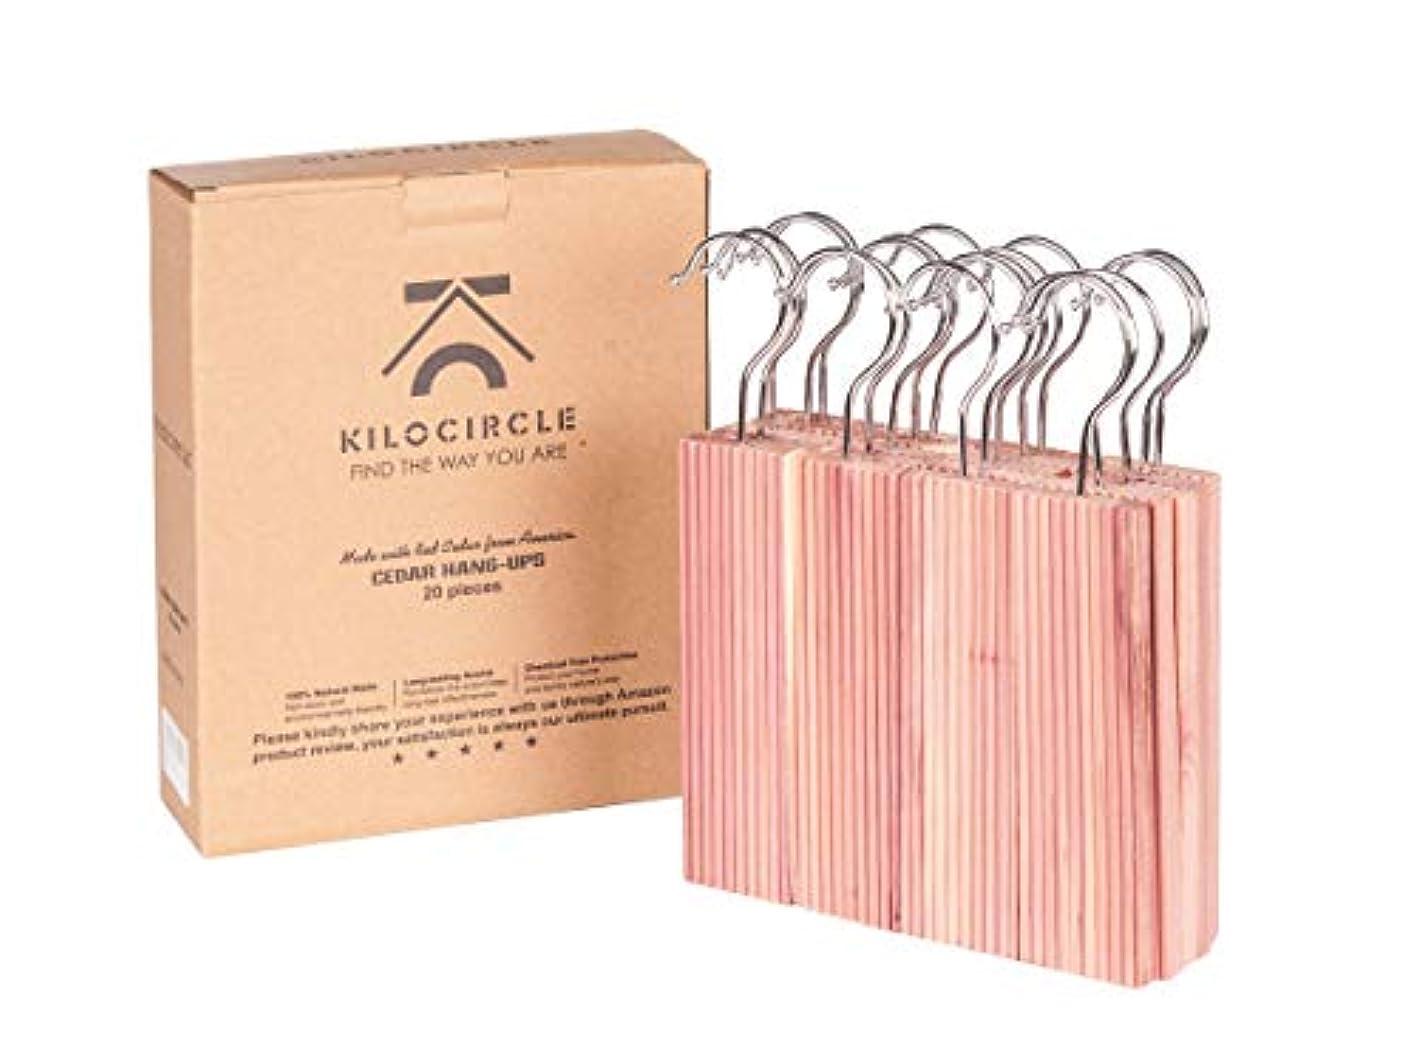 kilocircle [Newly Upgraded:Hook Assembled] Cedar Hang ups for Closet 20pcs with Cedar Fragrance-Standard Size 6.5''x1.9''X0.5''